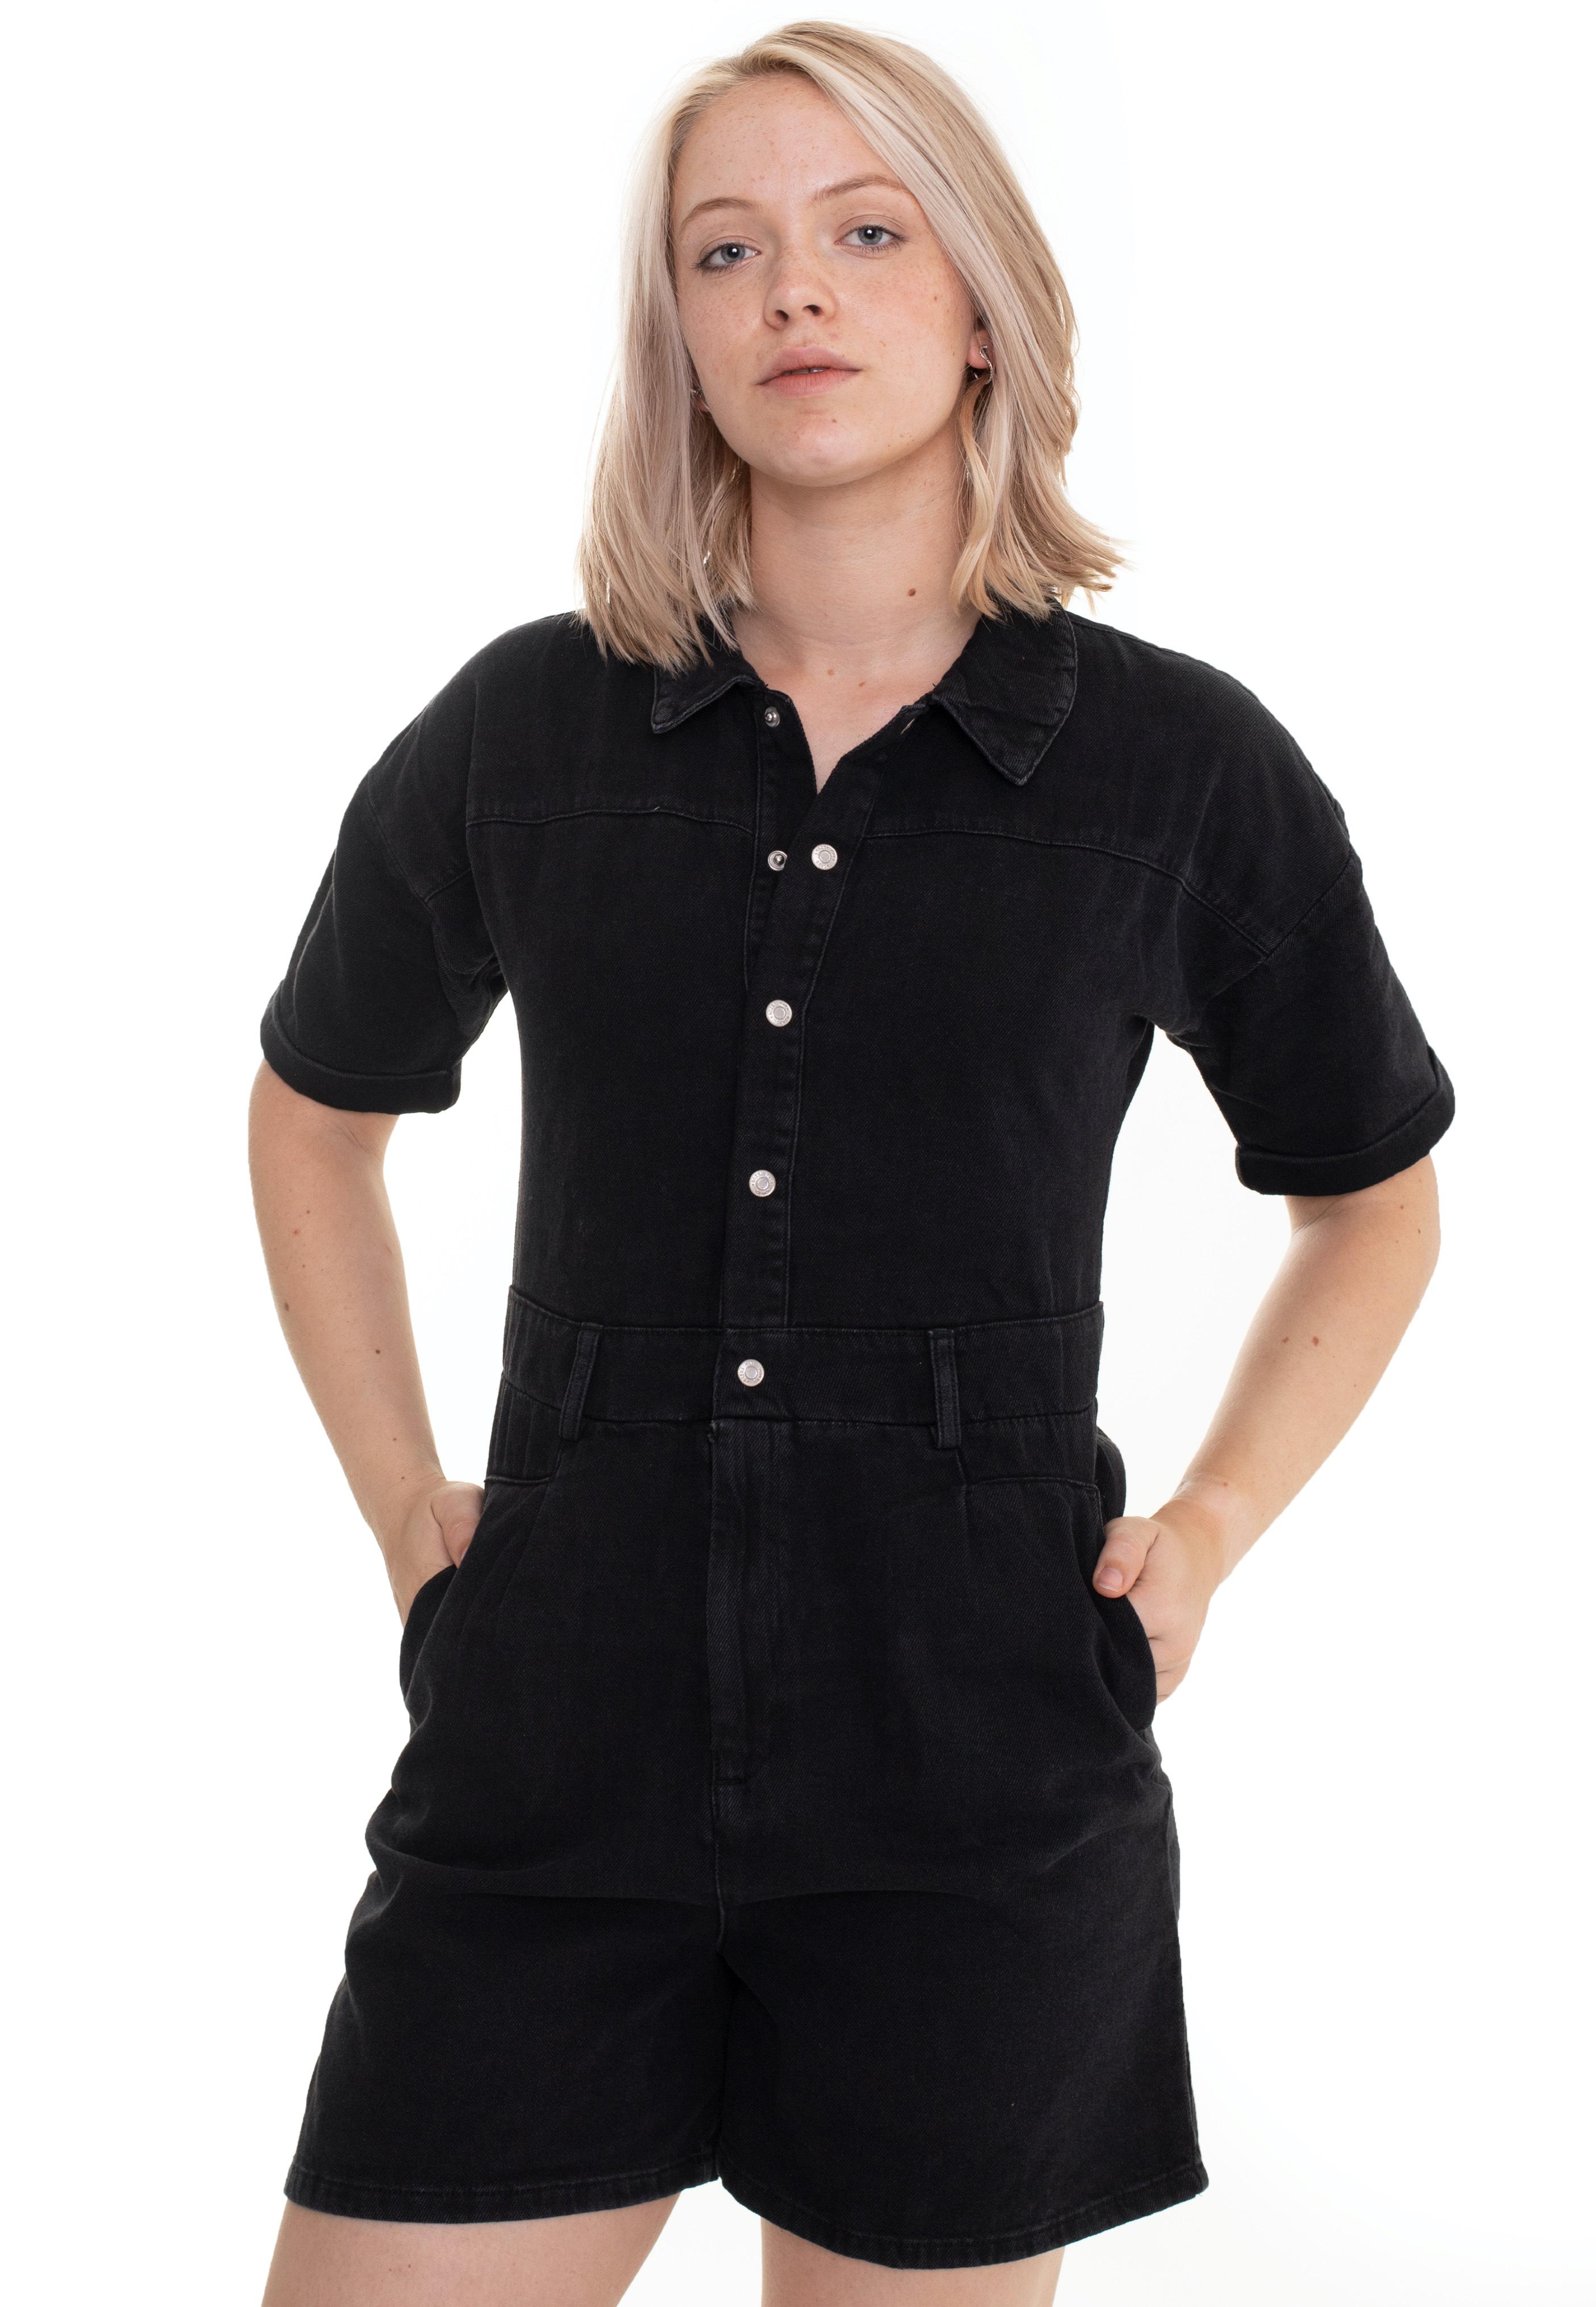 Hosen - Noisy May Denise Playsuit Black Denim Jumpsuits  - Onlineshop IMPERICON